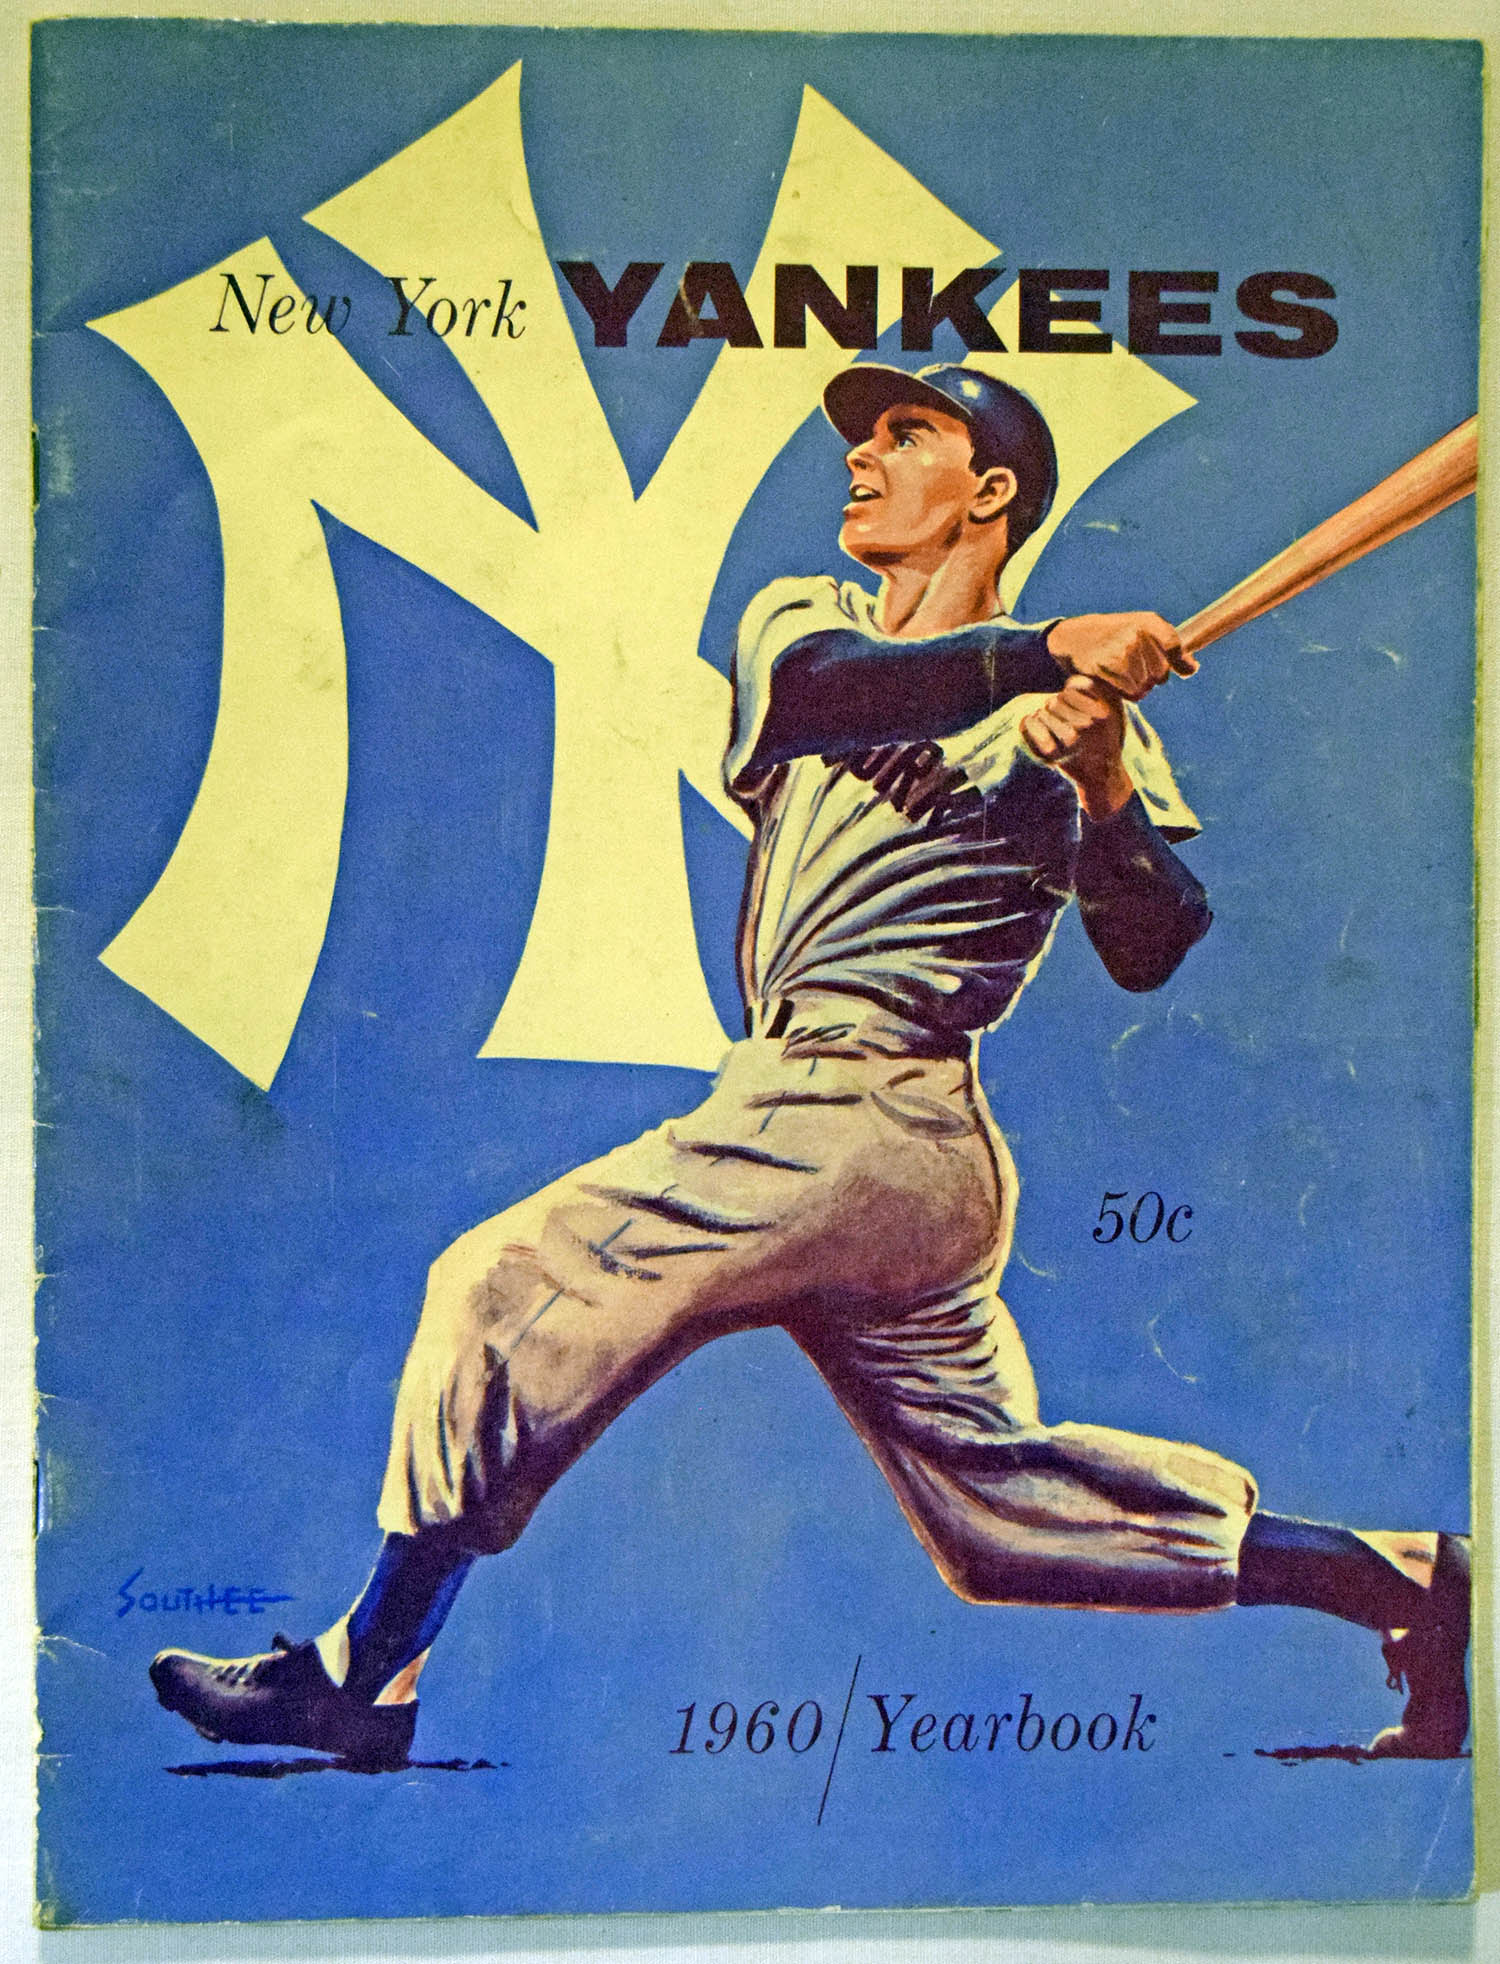 1960 Yearbook  New York Yankees (Jay) VG-Ex